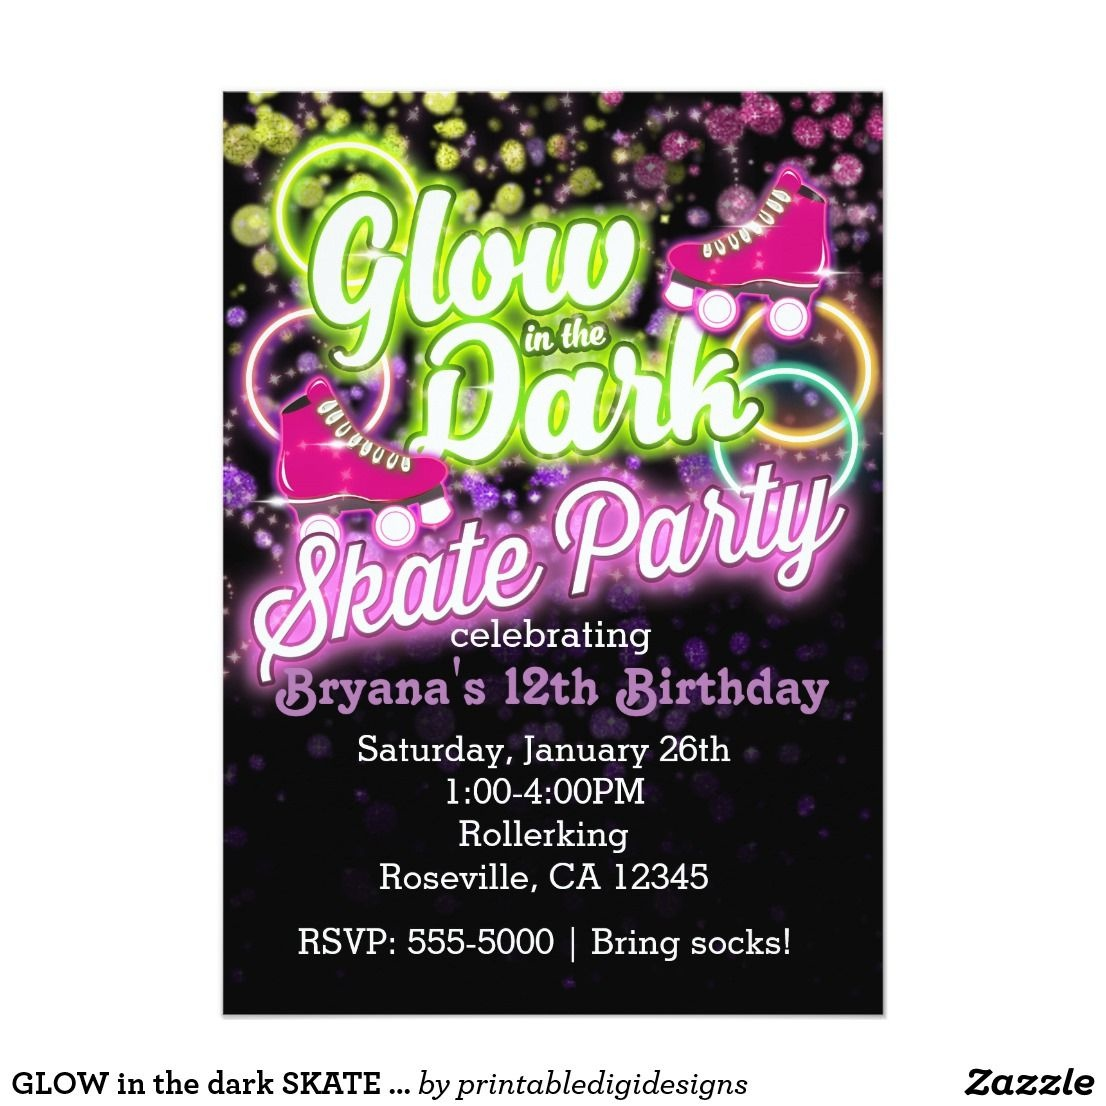 Glow In The Dark Skate Party Birthday Invitation | Zazzle In - Free Printable Glow In The Dark Birthday Party Invitations